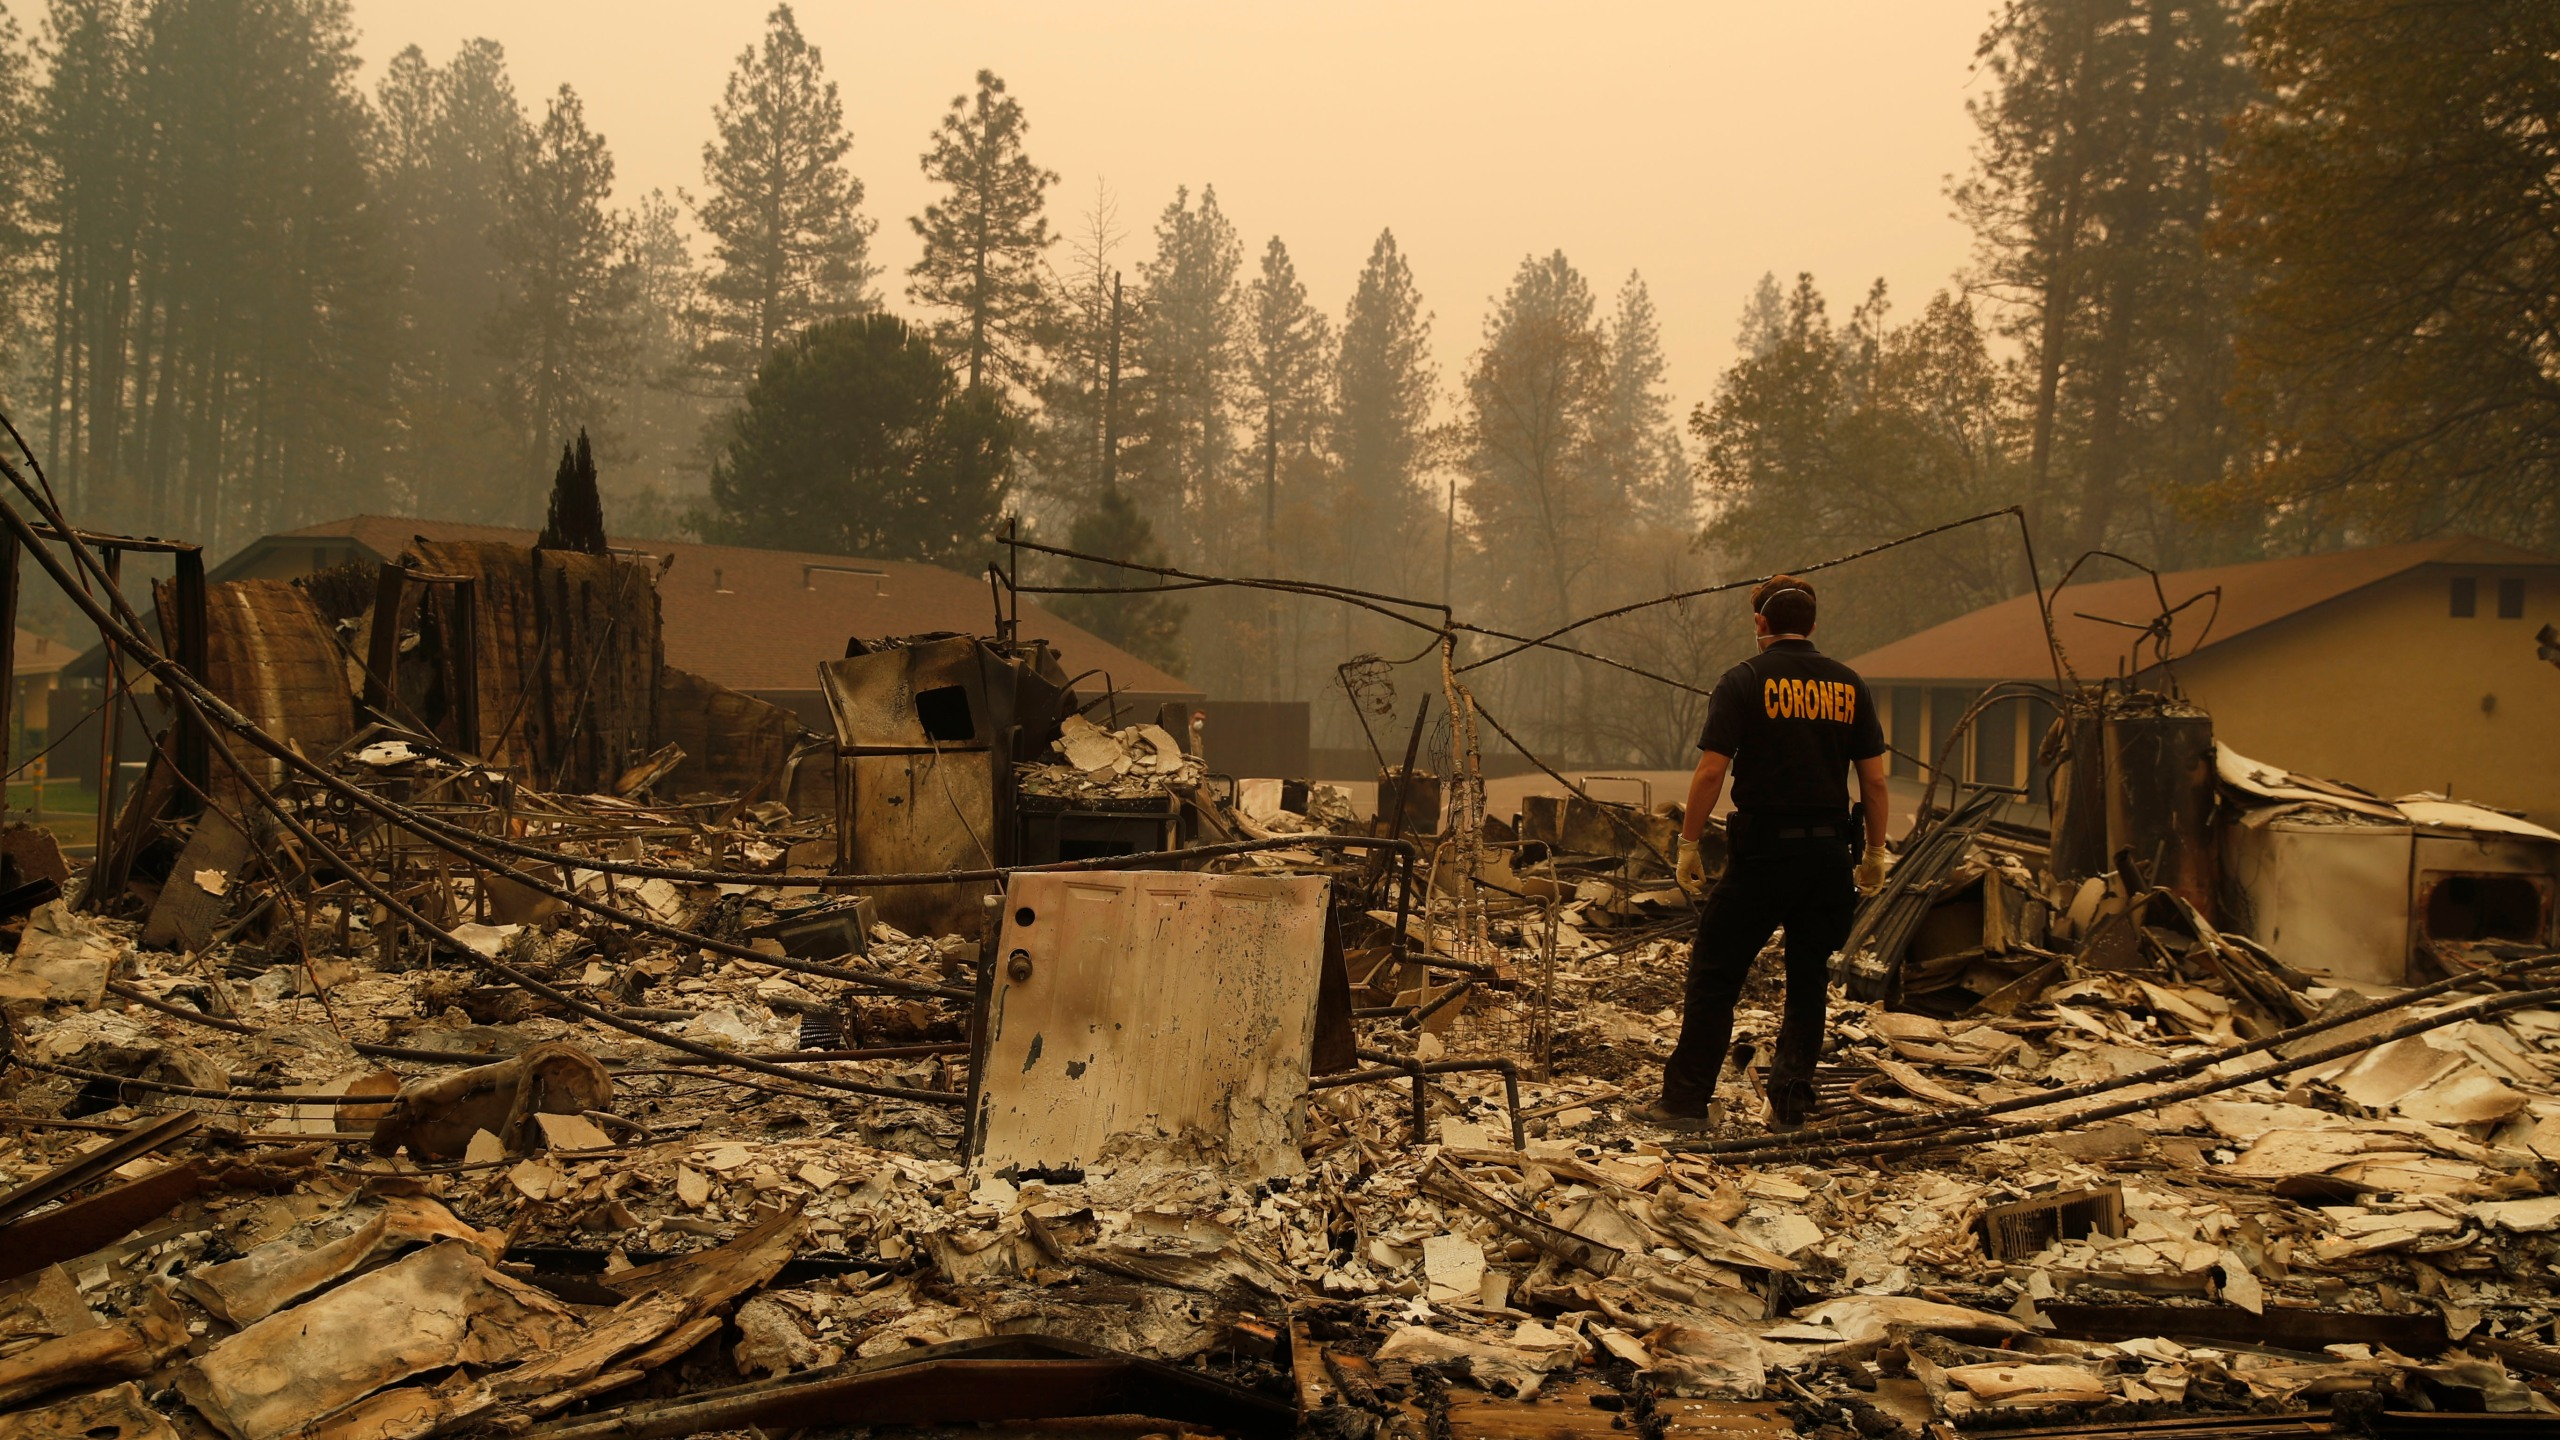 California_Wildfires_60716-159532.jpg69682689